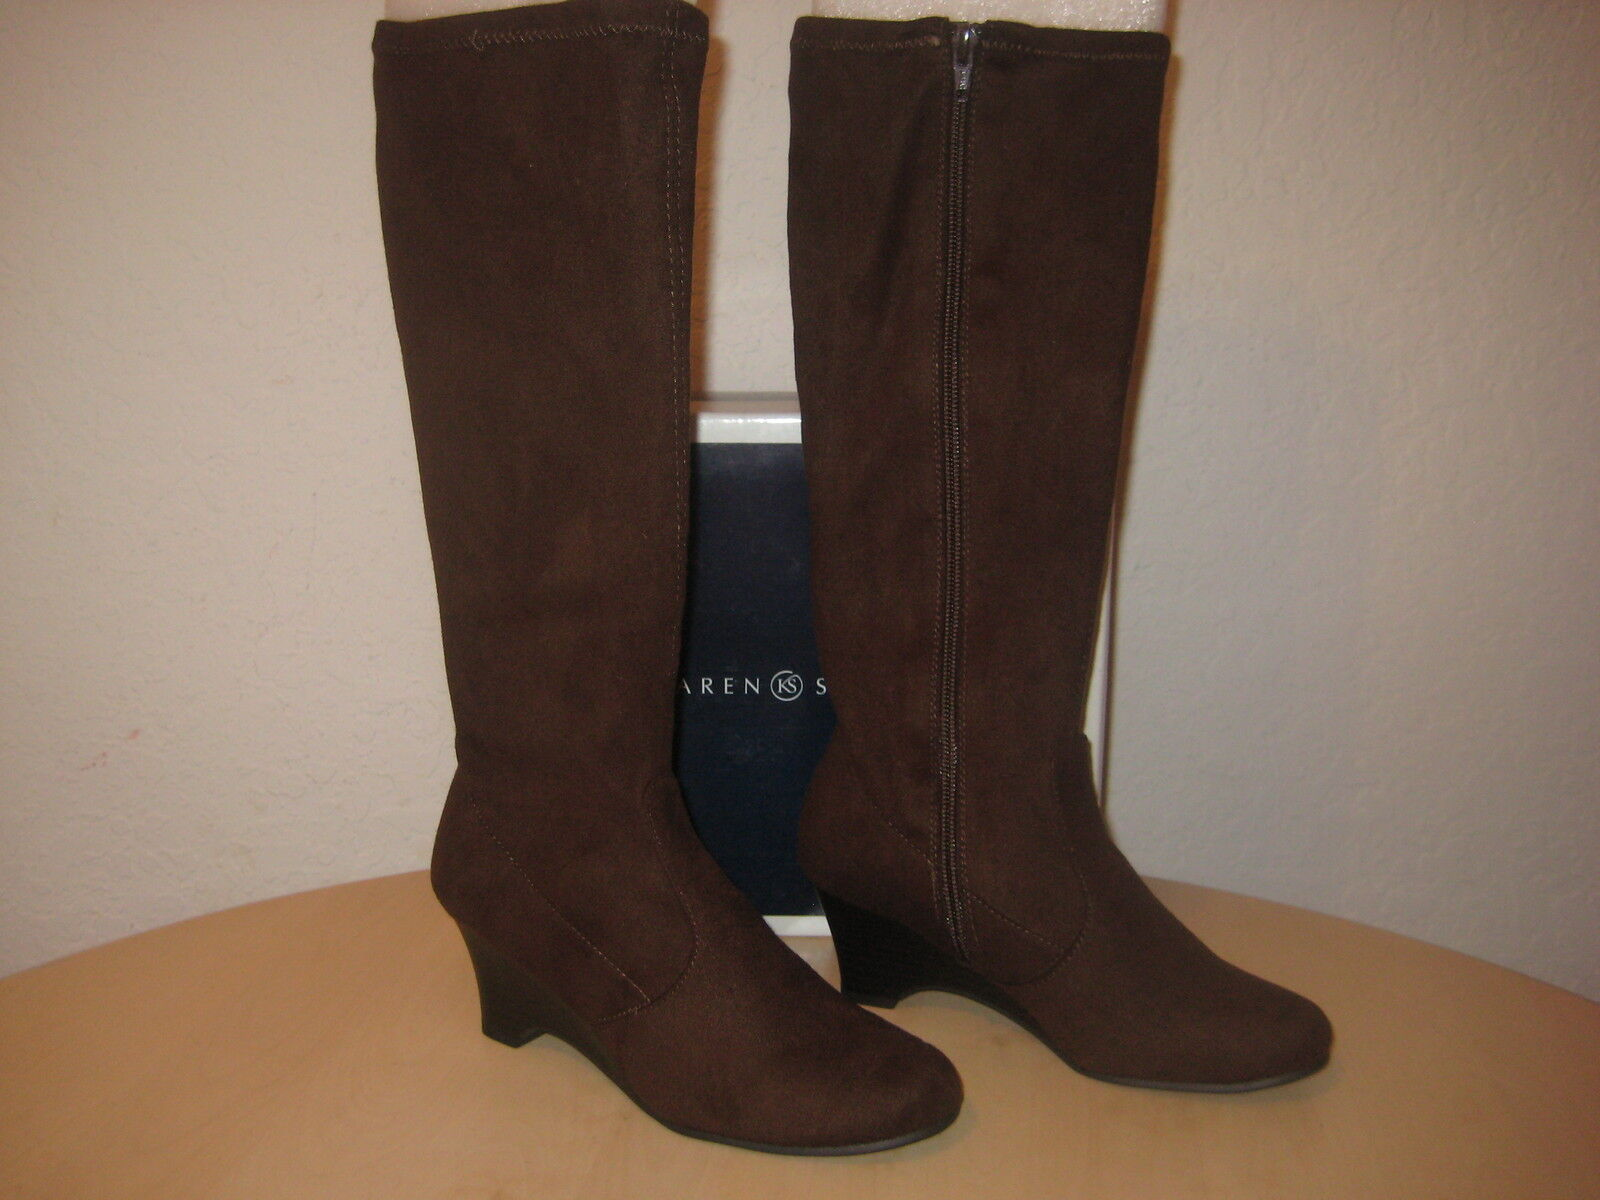 Karen Scott shoes Size 5.5 M New Womens Lena Brown Fashion Wedge Boots NWB